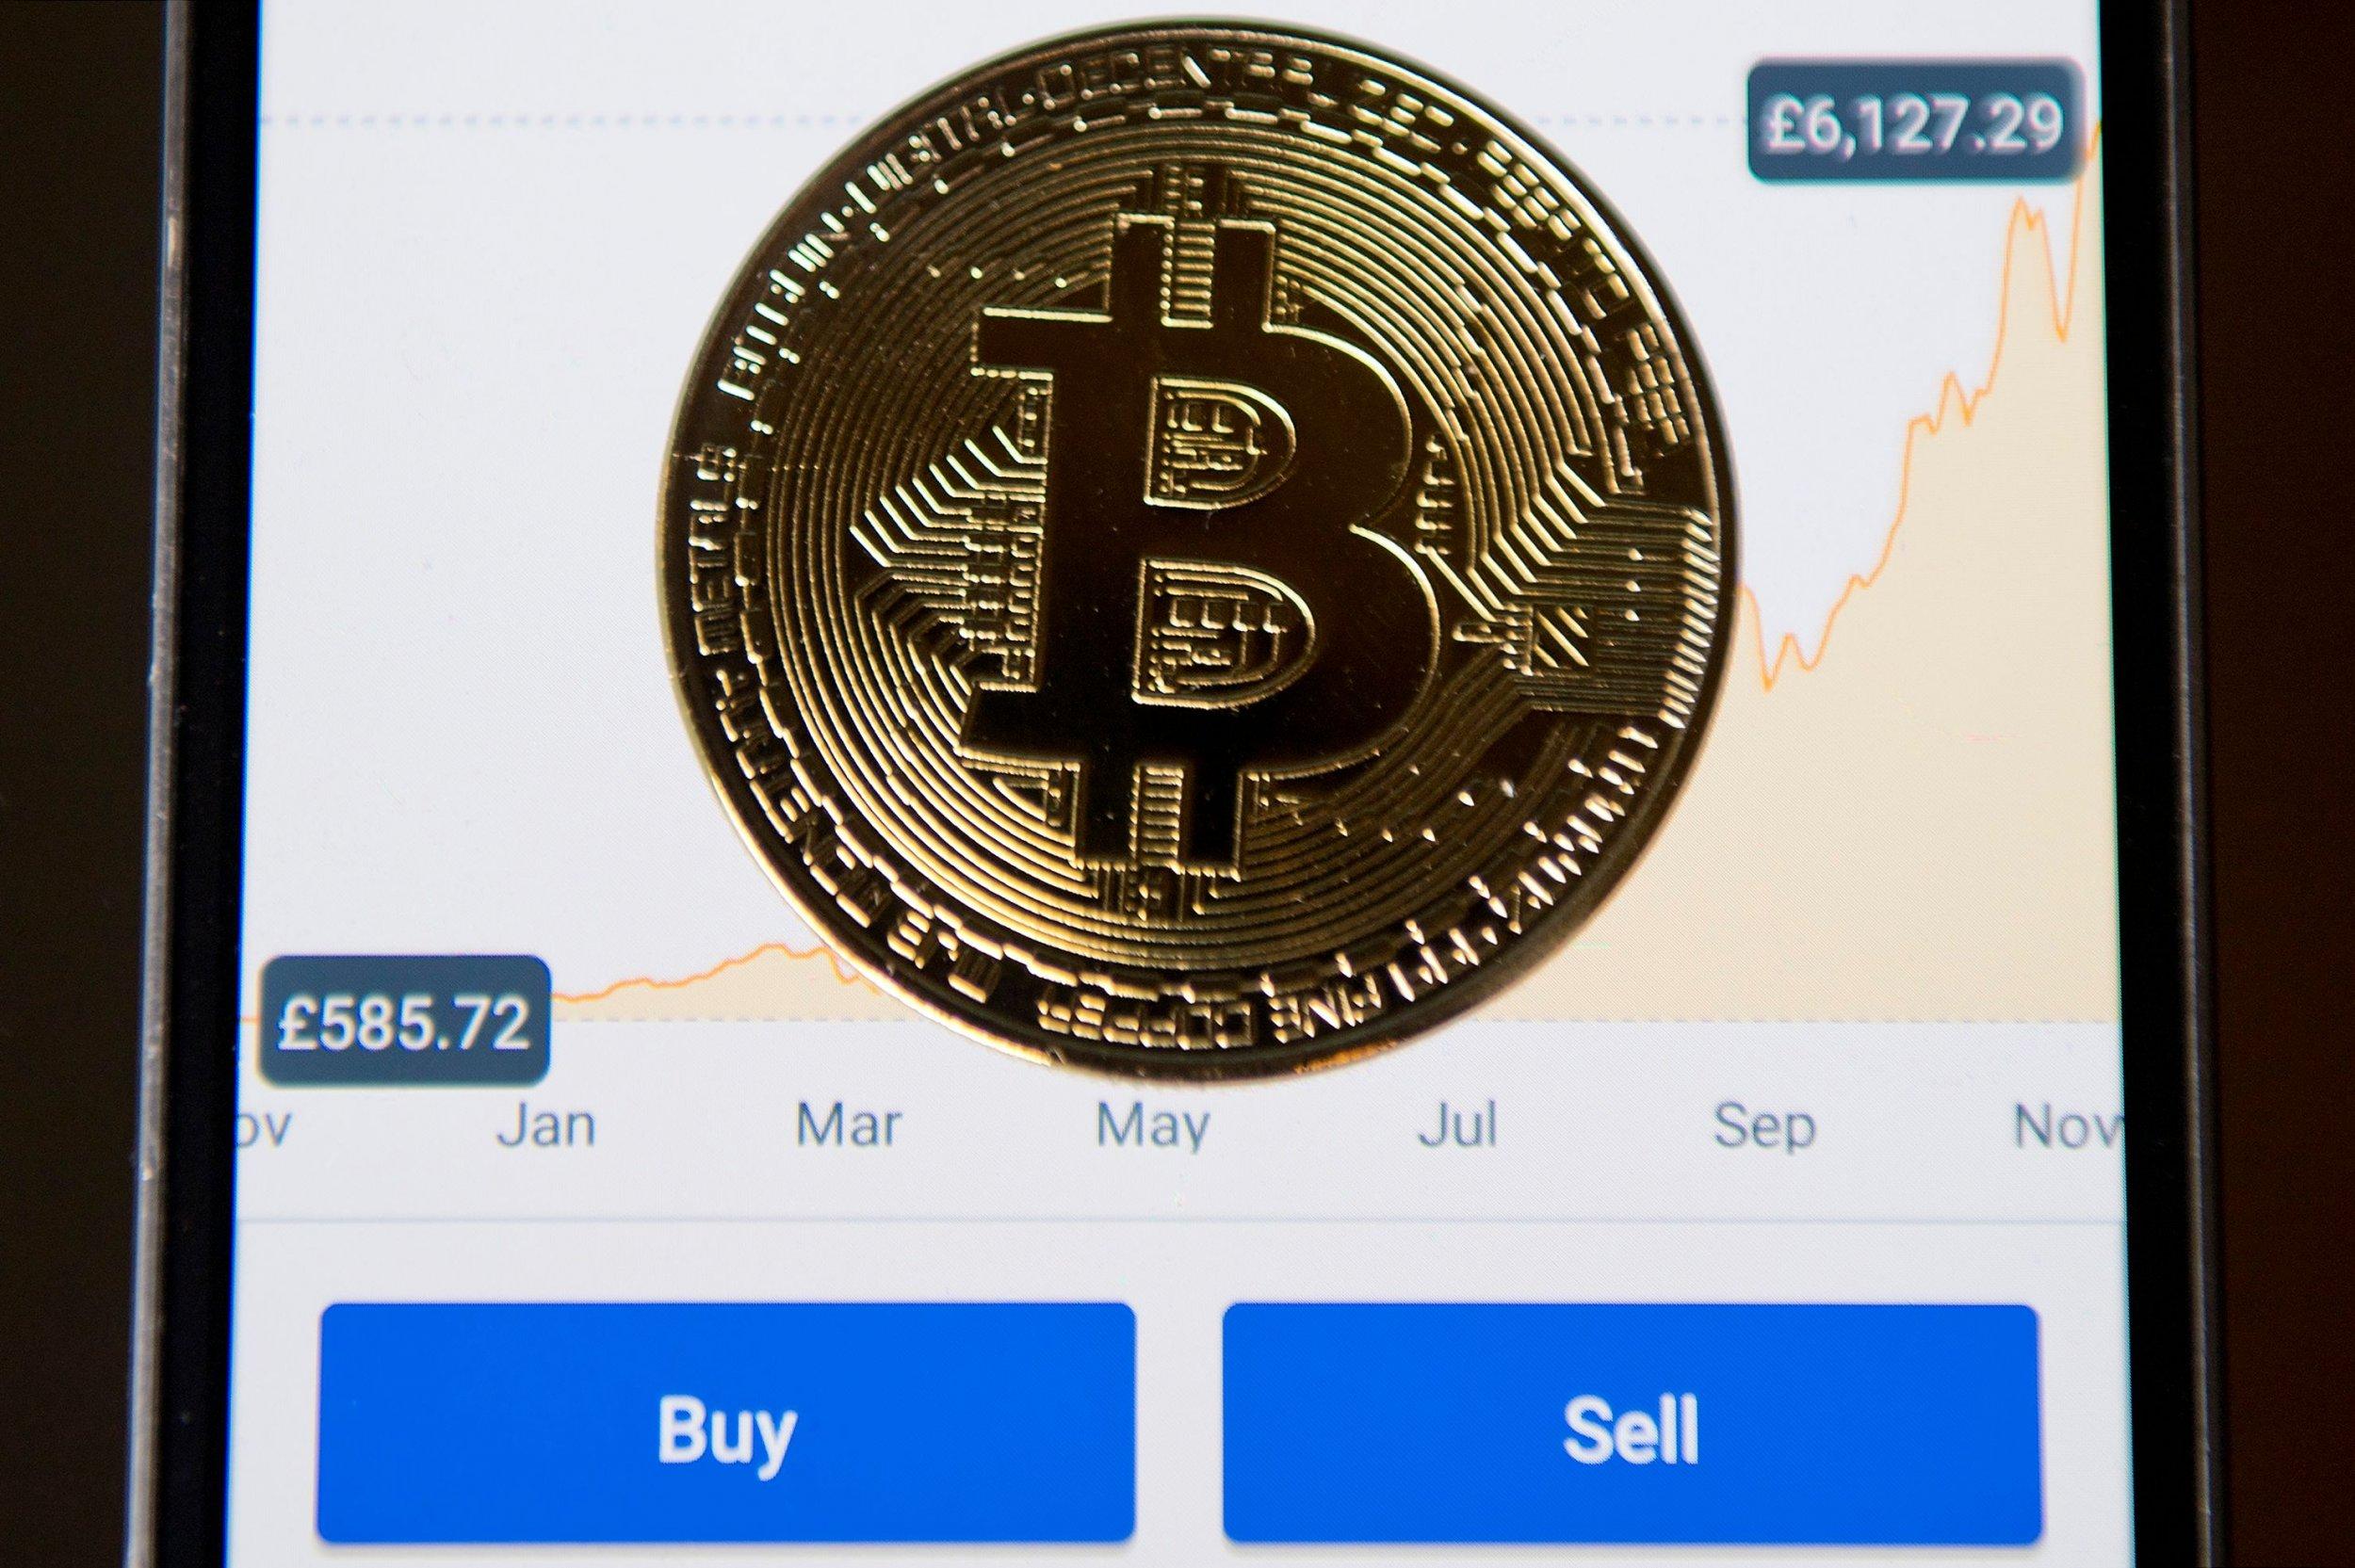 coinbase trading bitcoin for ethereum